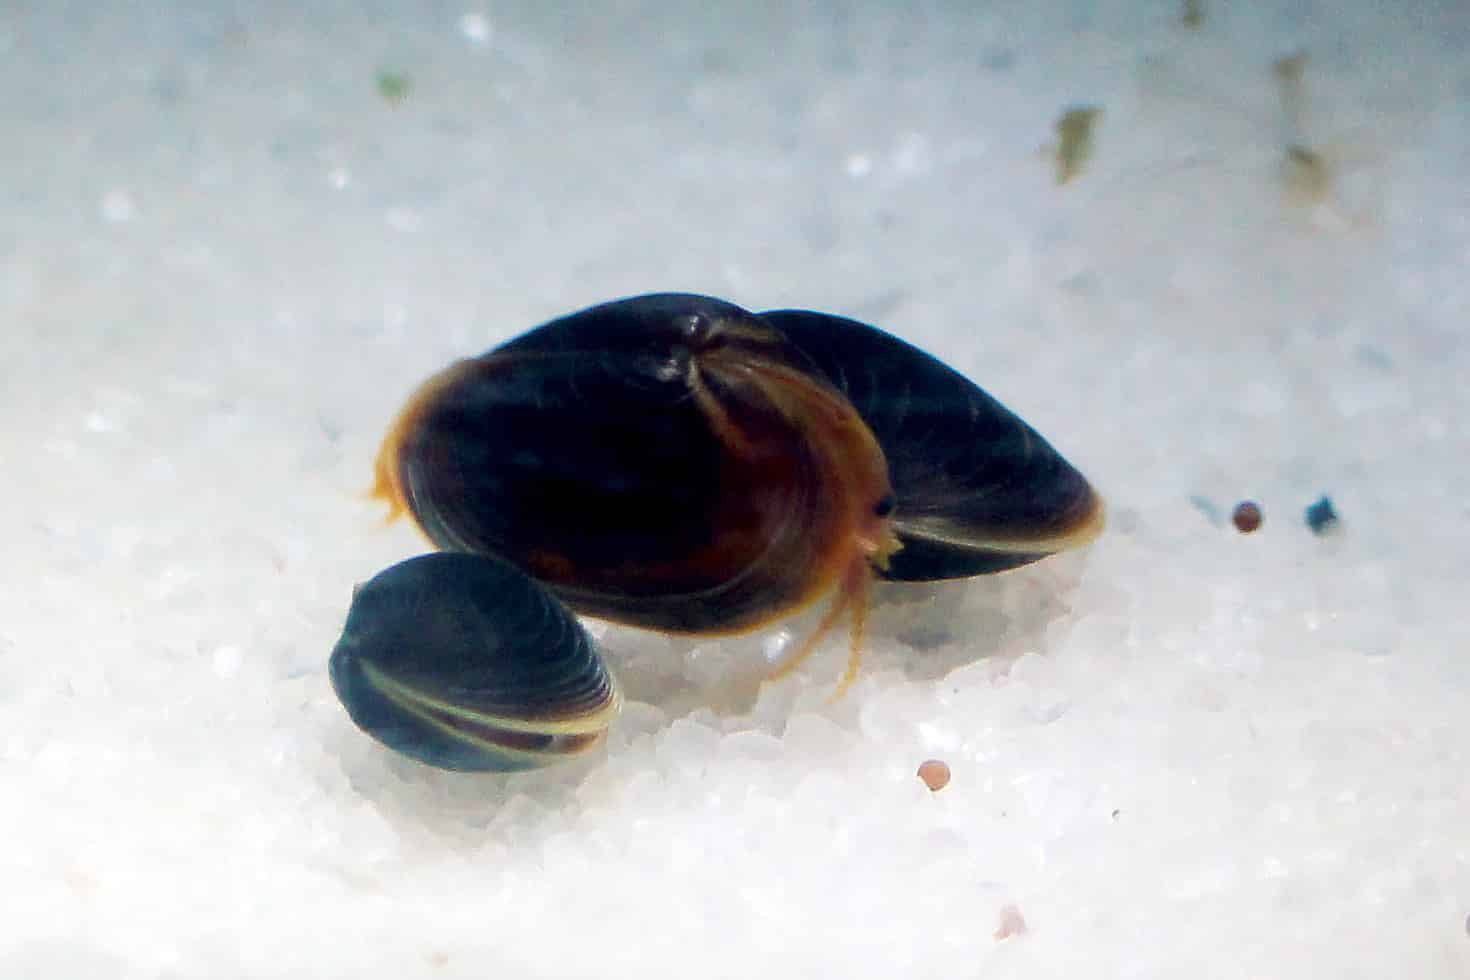 Cyzicus sp. Schwarzer Muschelschaler